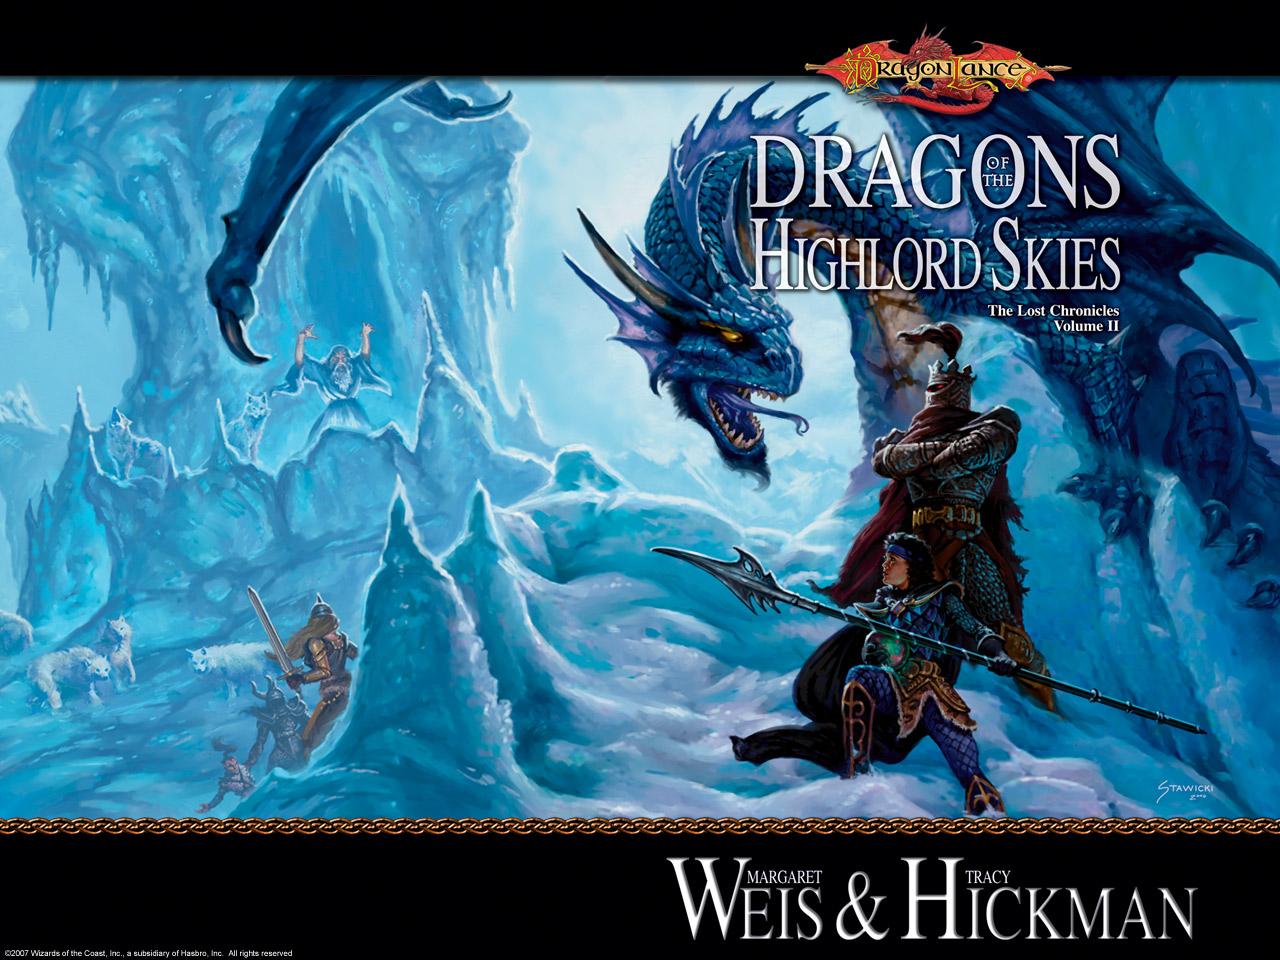 dragonlance wallpaper 1280x960